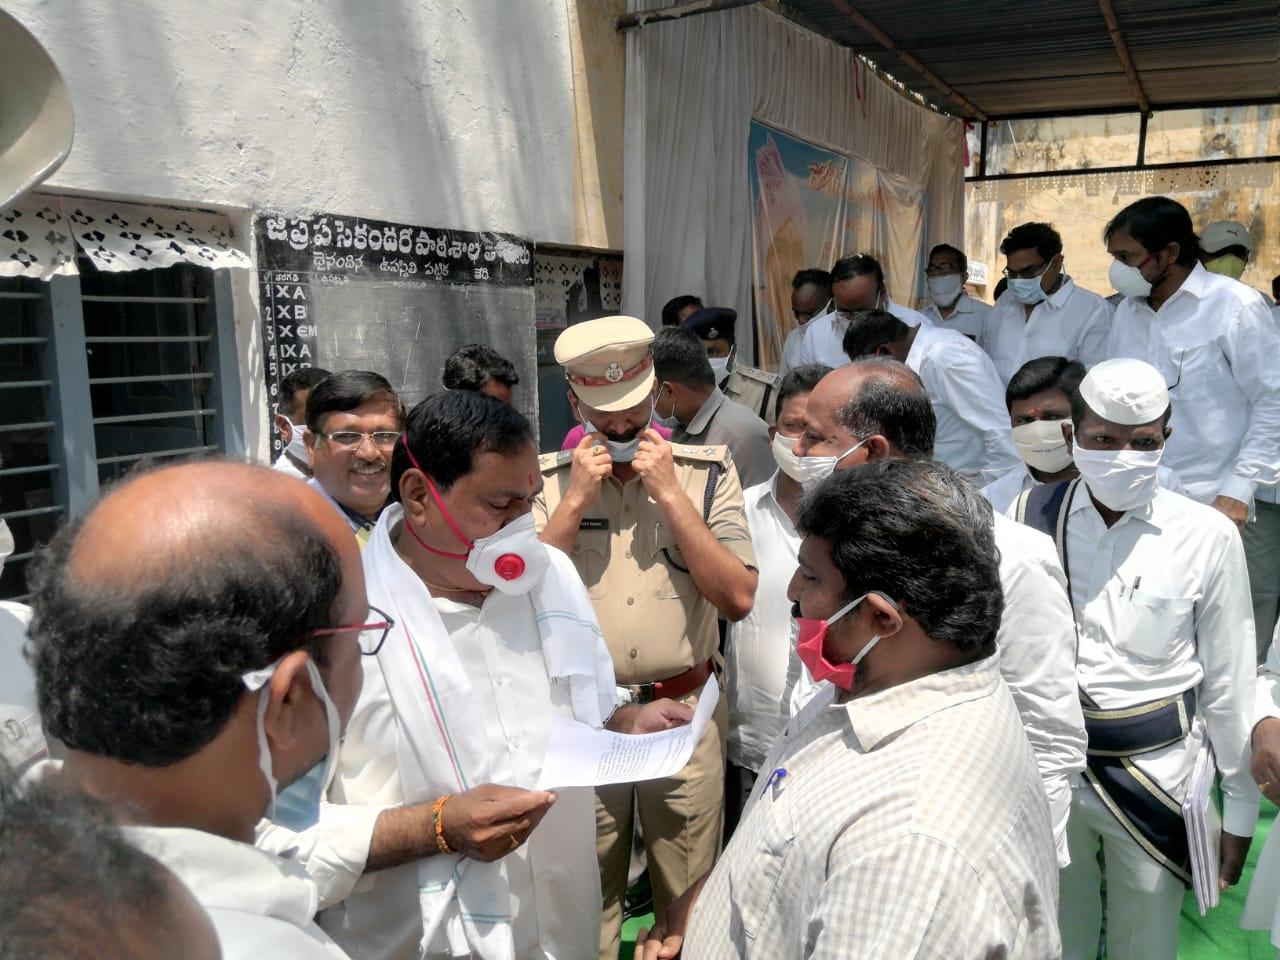 Kasthuri Pulendar | Pulendar | BJP OBC Morcha District President | Active member | Cheif Secretary | Secretary | Co-Convener | Social Activist | Chinnamupparam | Thorrur | Palakurthy | Mahabubabad | Telangana | BJP | theLeadersPage